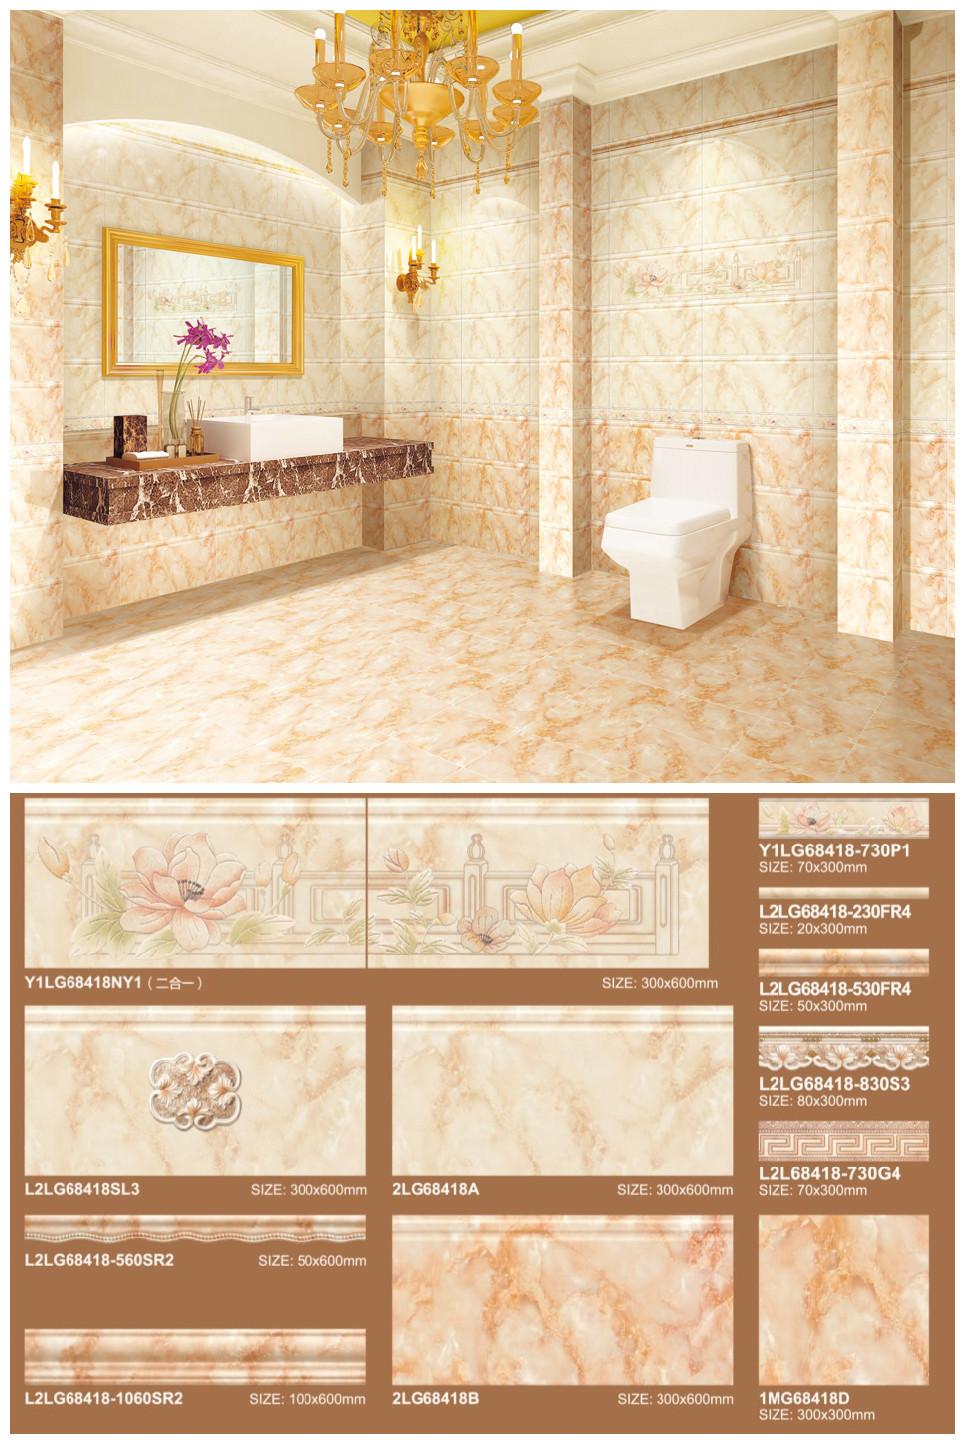 Jbn cheap ceramic tiles malaysia 3d ceramic floor tile ceramic tile jbn cheap ceramic tiles malaysia 3d ceramic floor tile ceramic tile price dailygadgetfo Choice Image